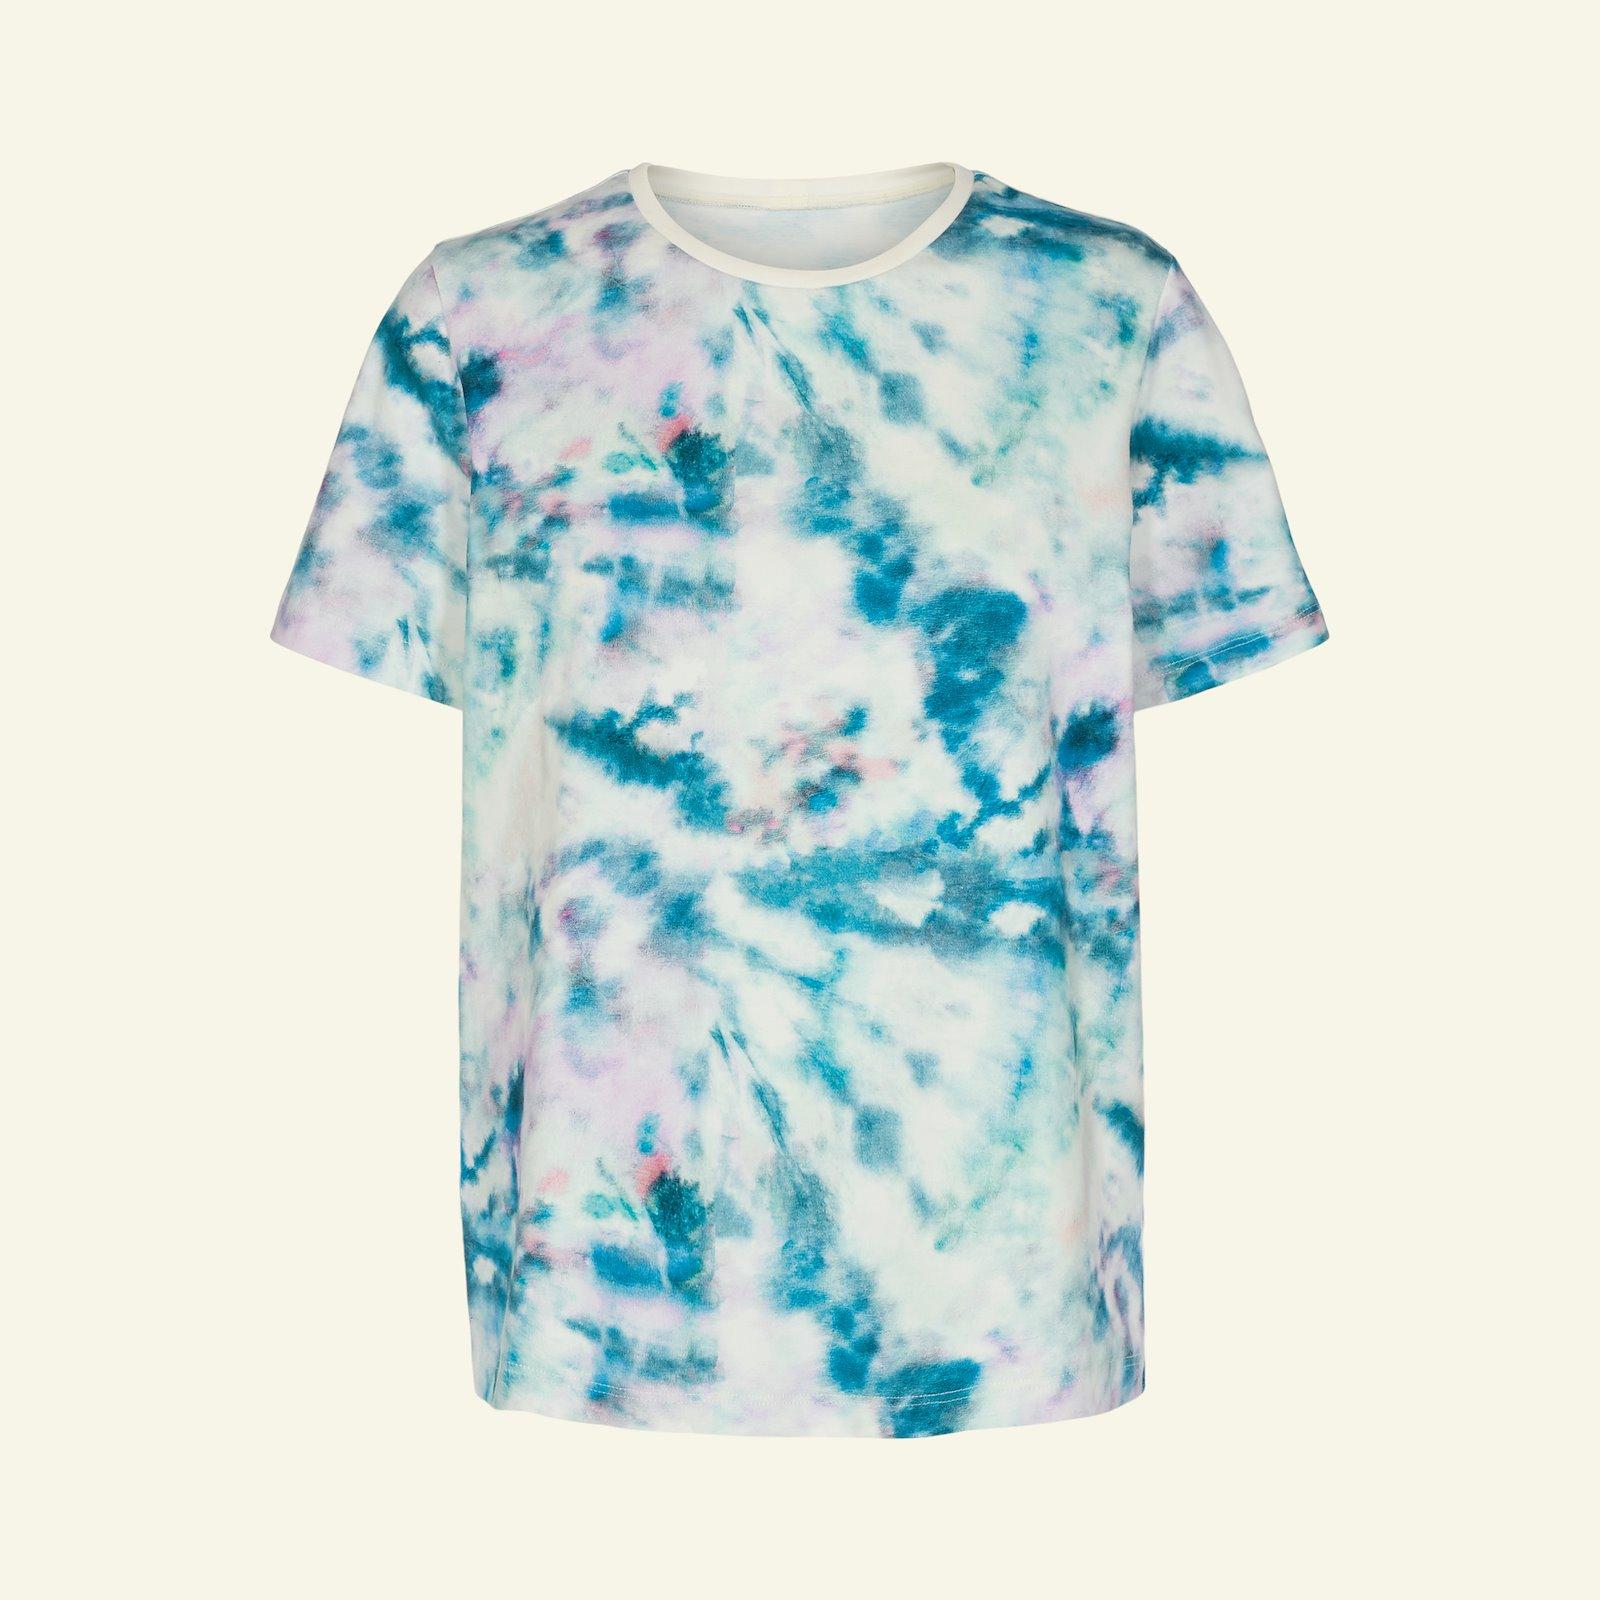 T-shirt and dress, 44/16 p22070_272729_sskit